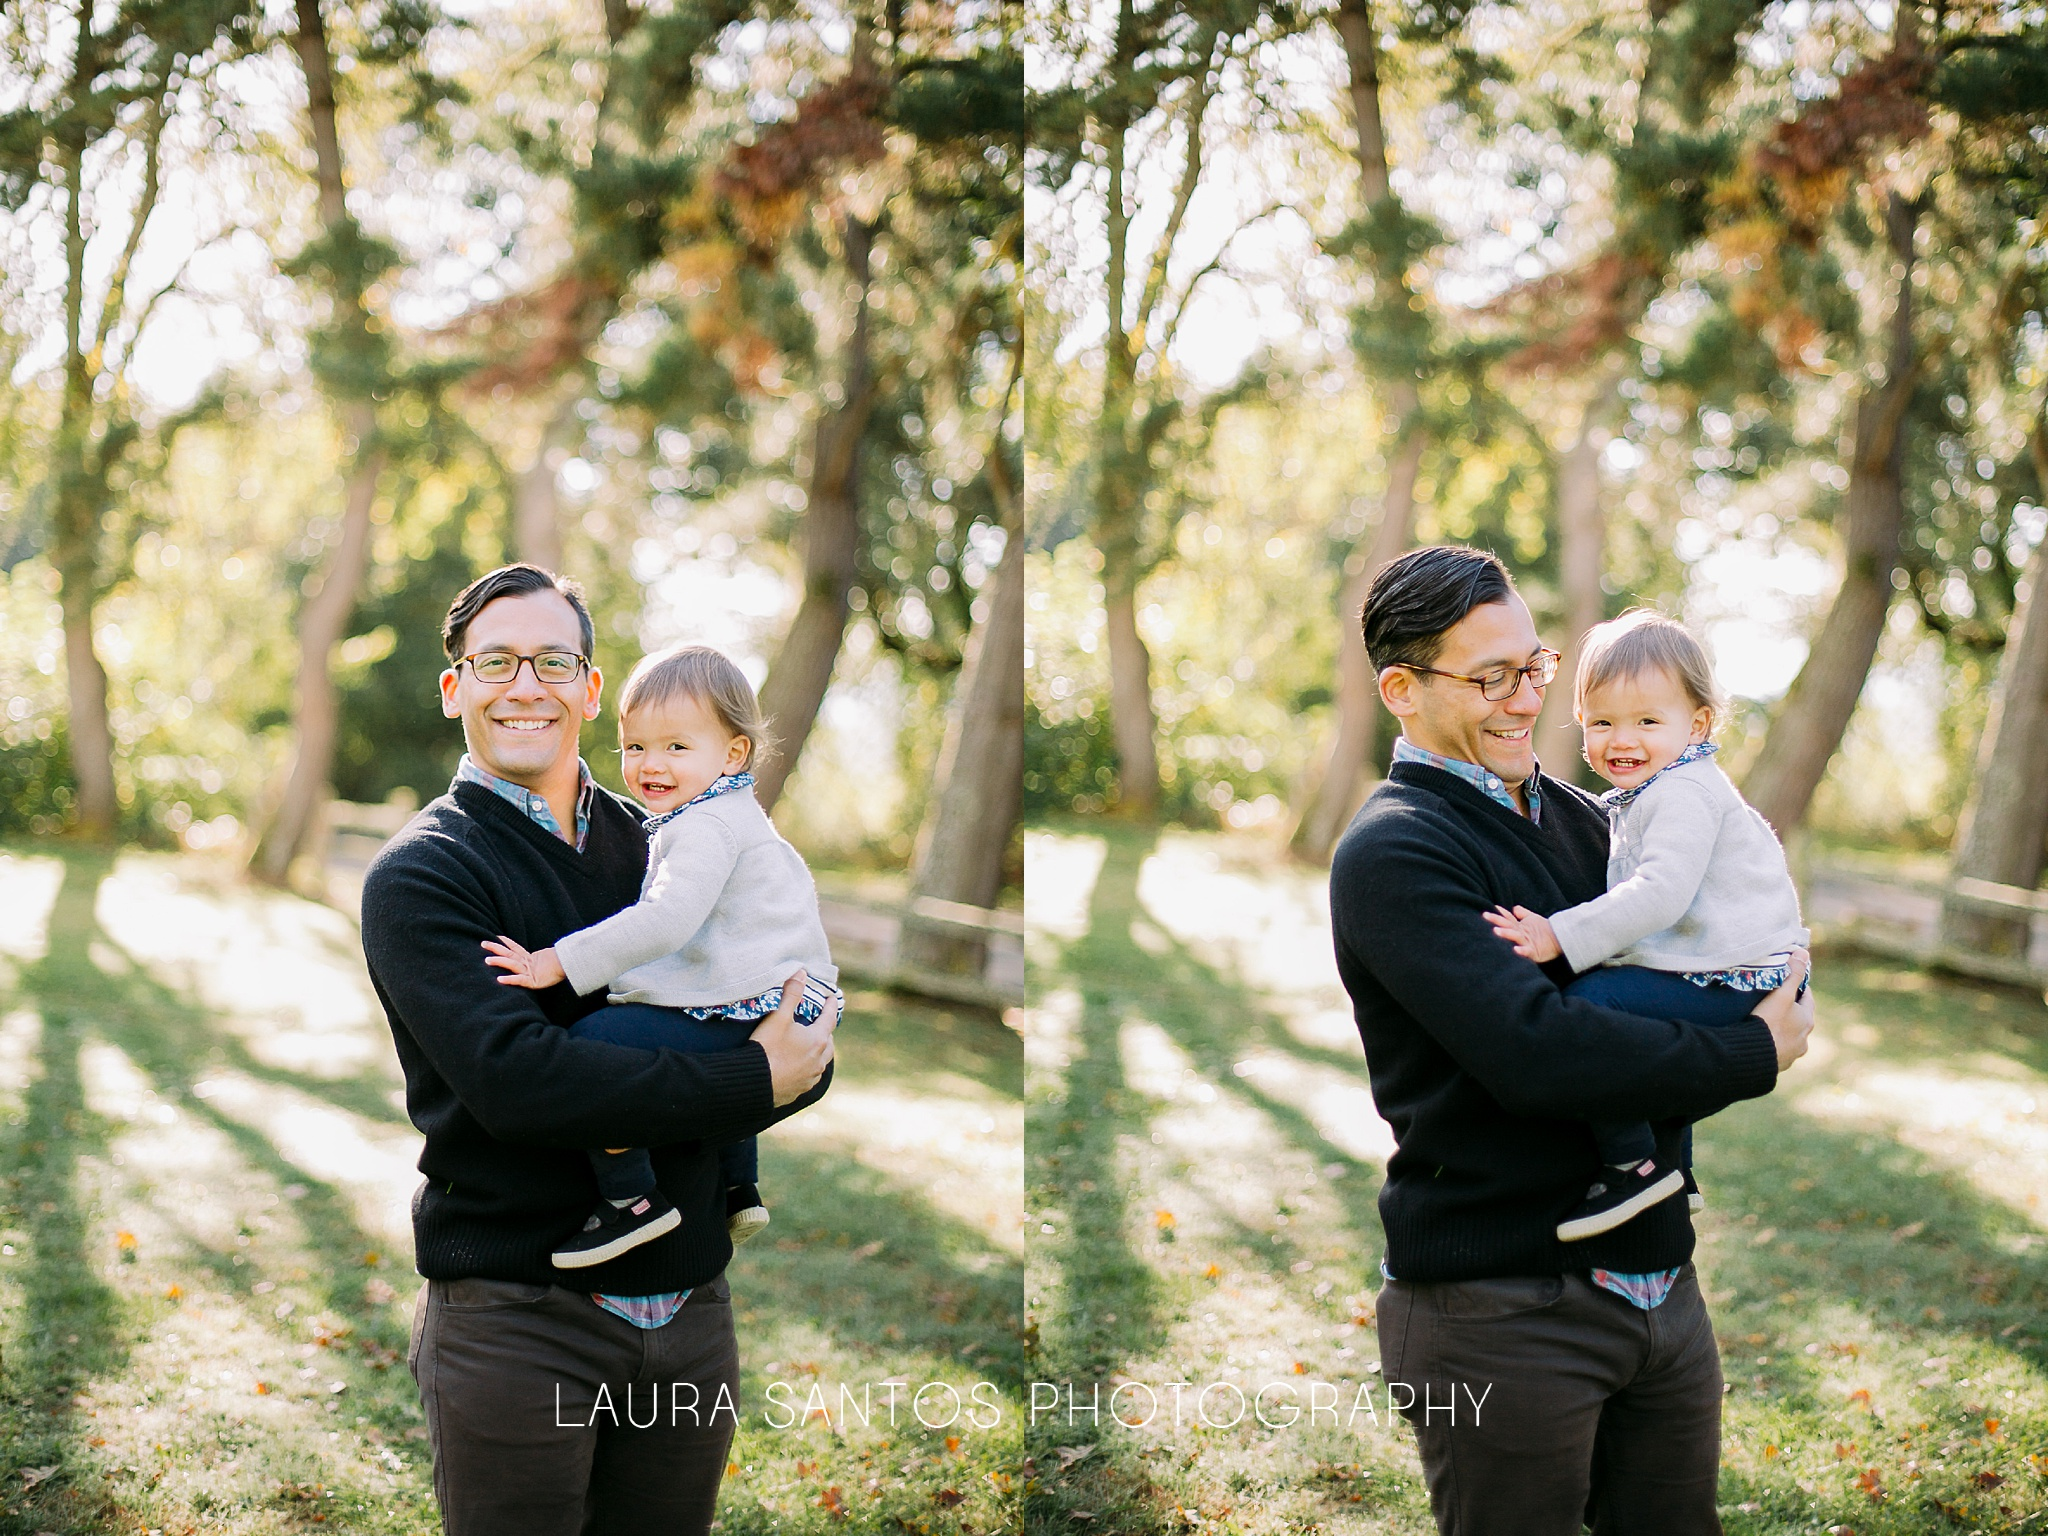 Laura Santos Photography Portland Oregon Family Photographer_0534.jpg